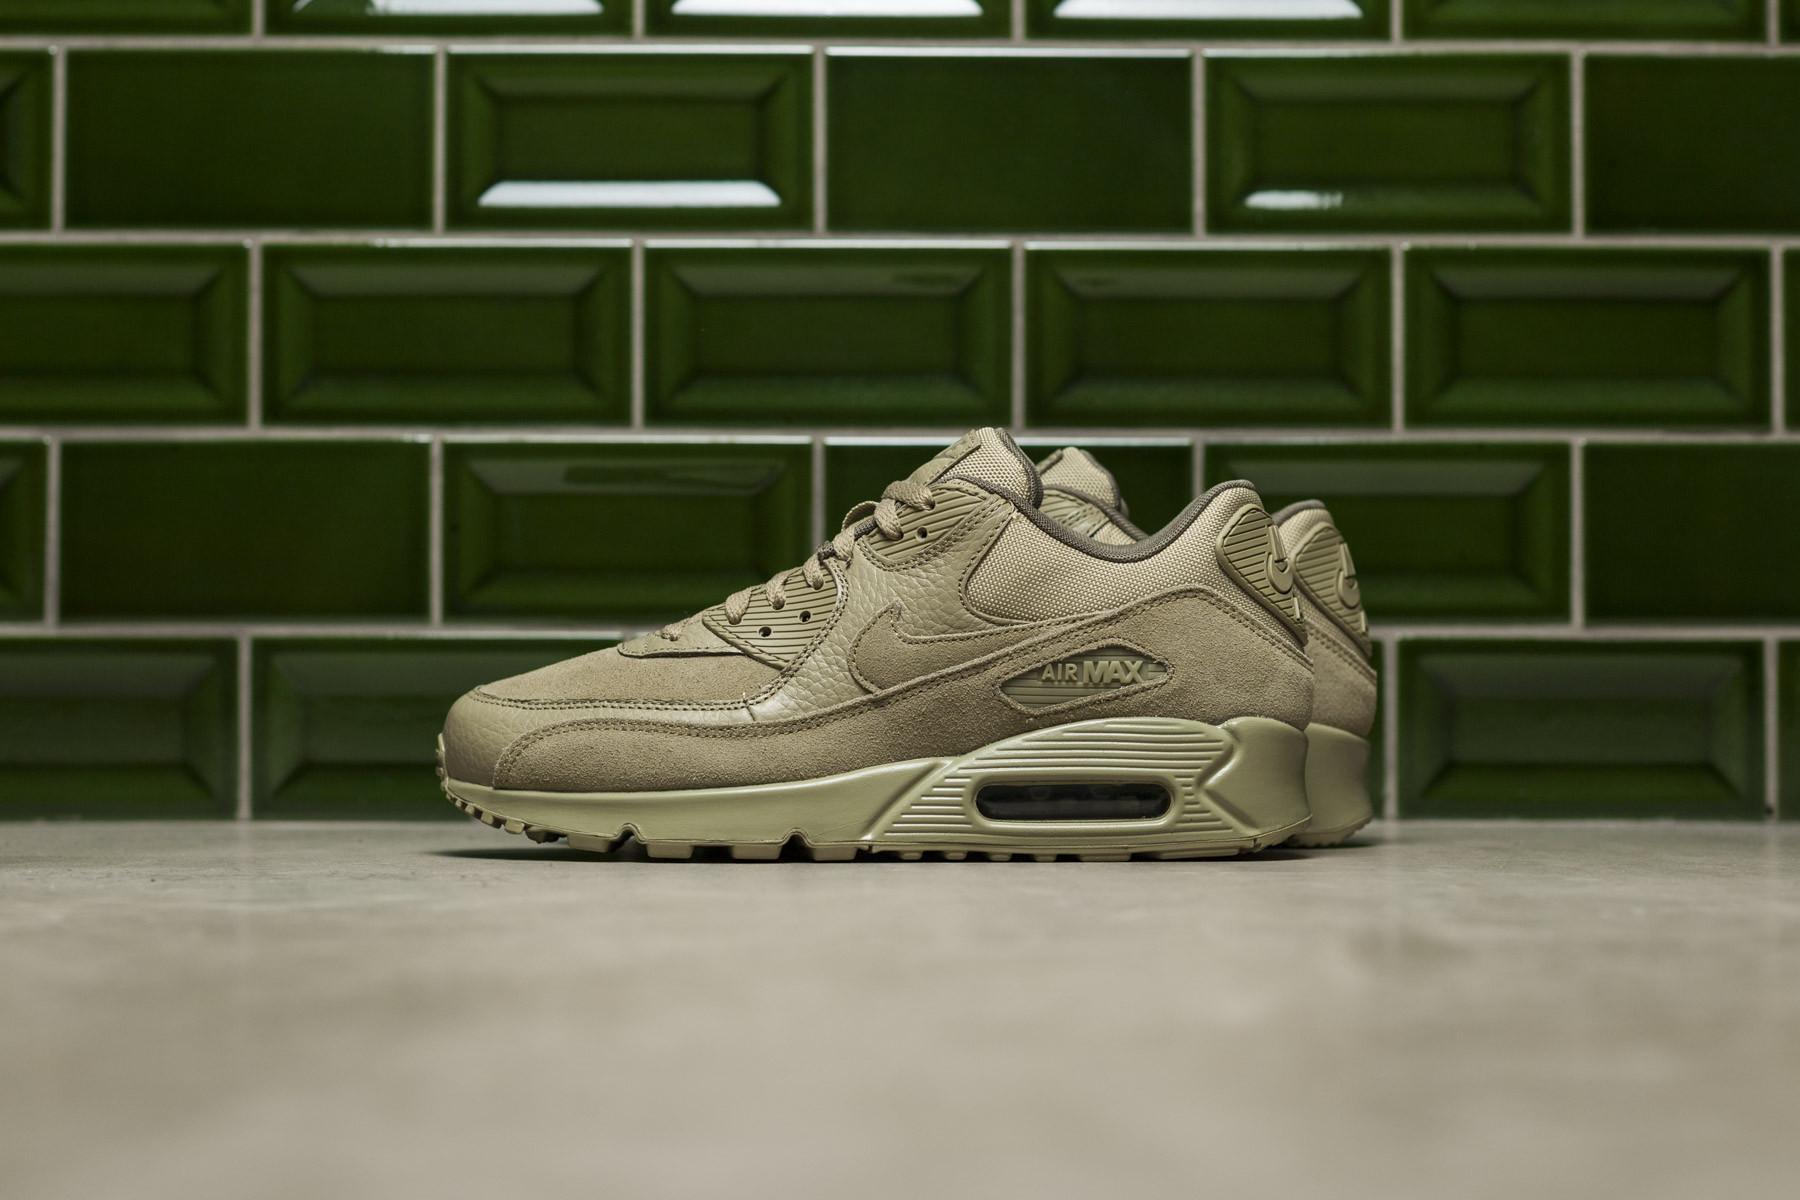 Nike Air Max 90 PRM Herre Sneakers Sneaker.no